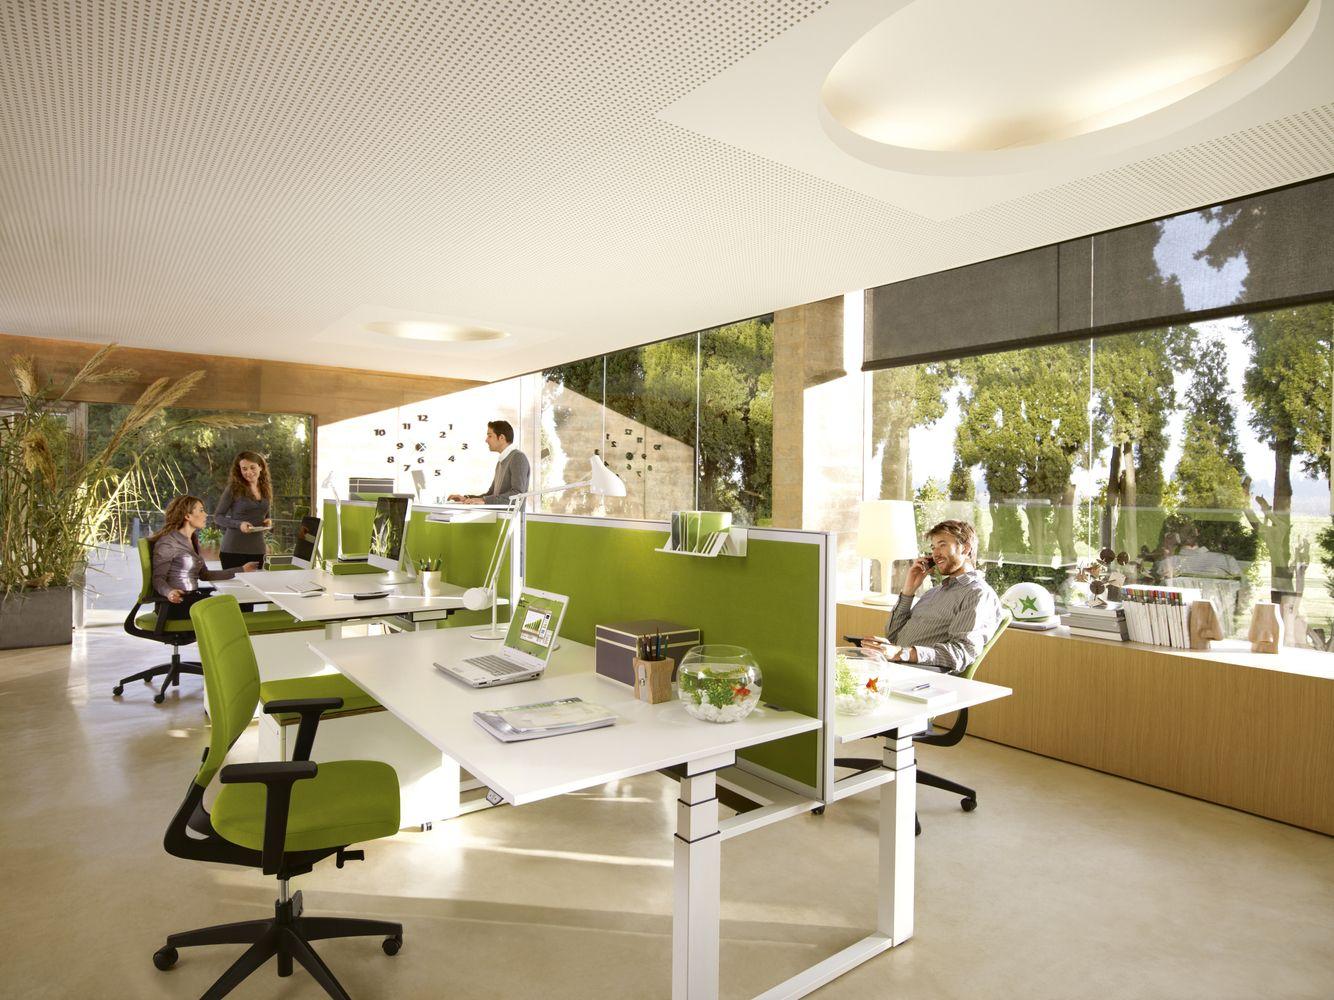 Büromöbel Krefeld openspace büros großraumbüro und büroausstattung